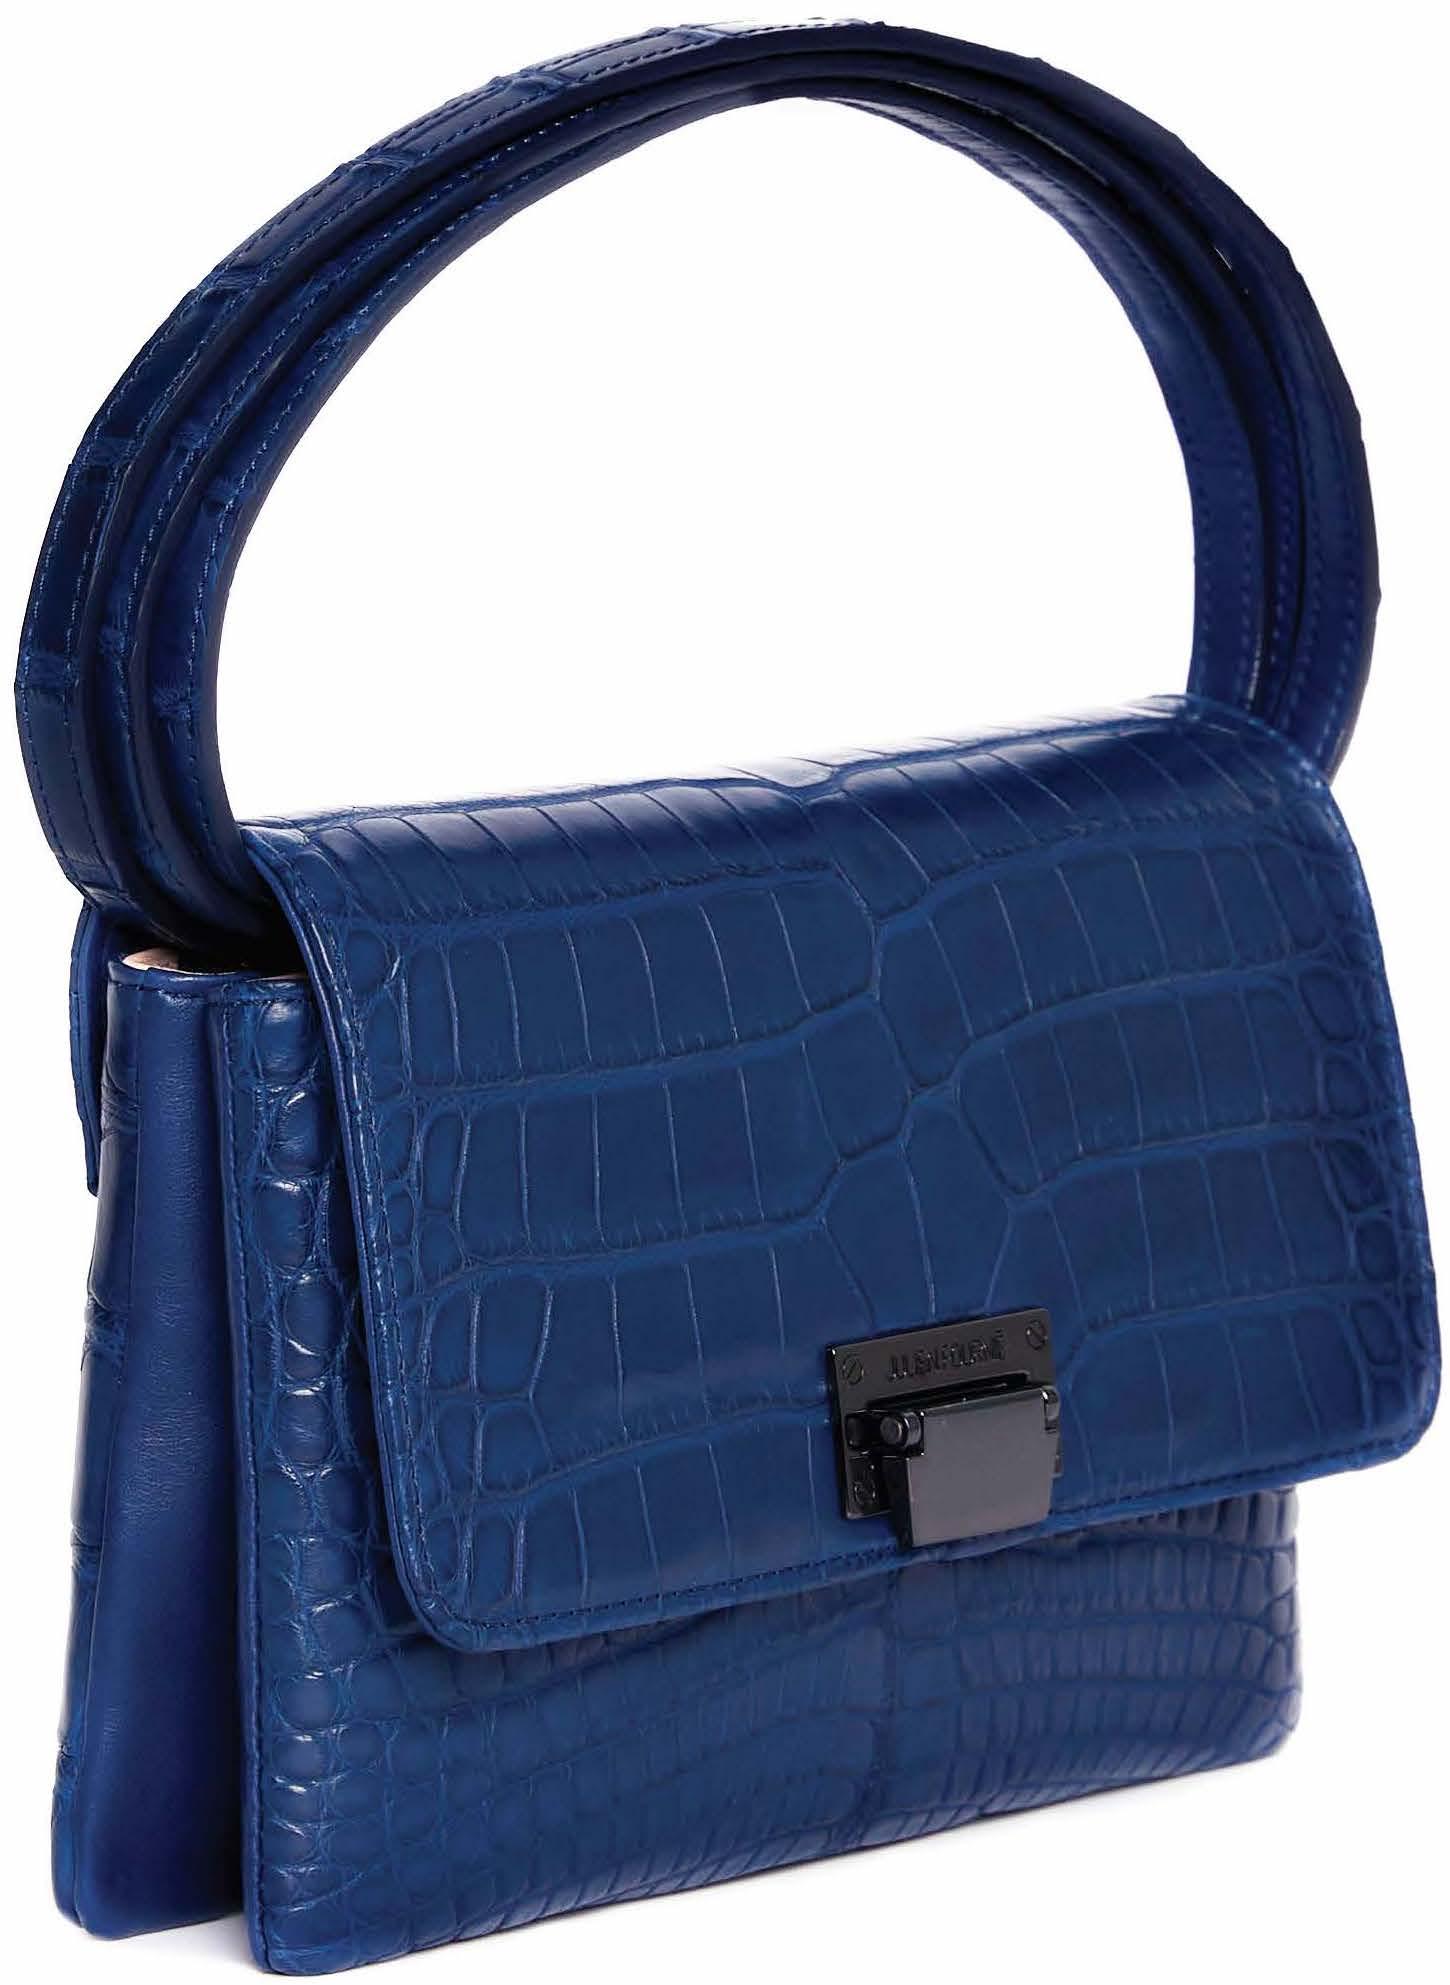 sac bleu en alligator